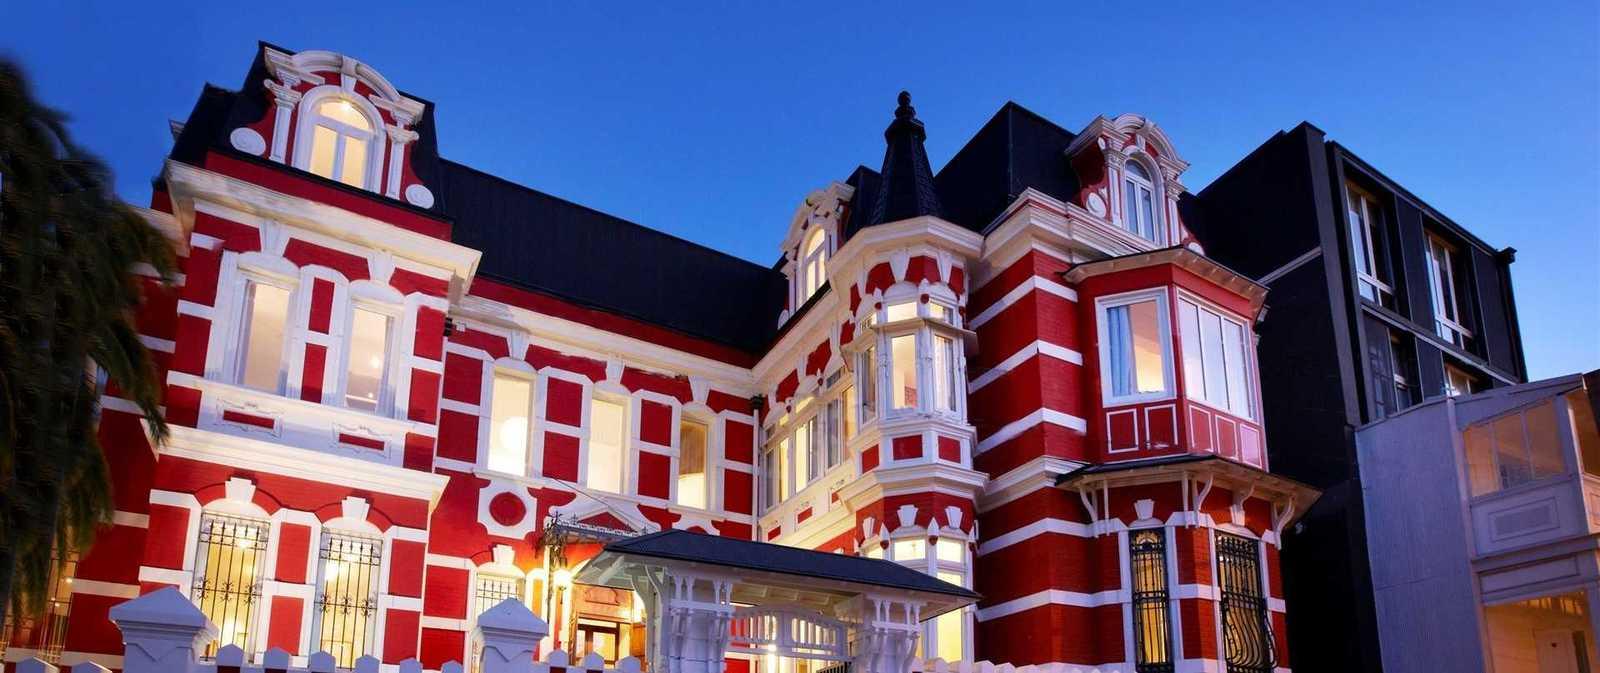 Best List of Hotels in Valparaiso, Chile - Hotel Palacio Astoreca